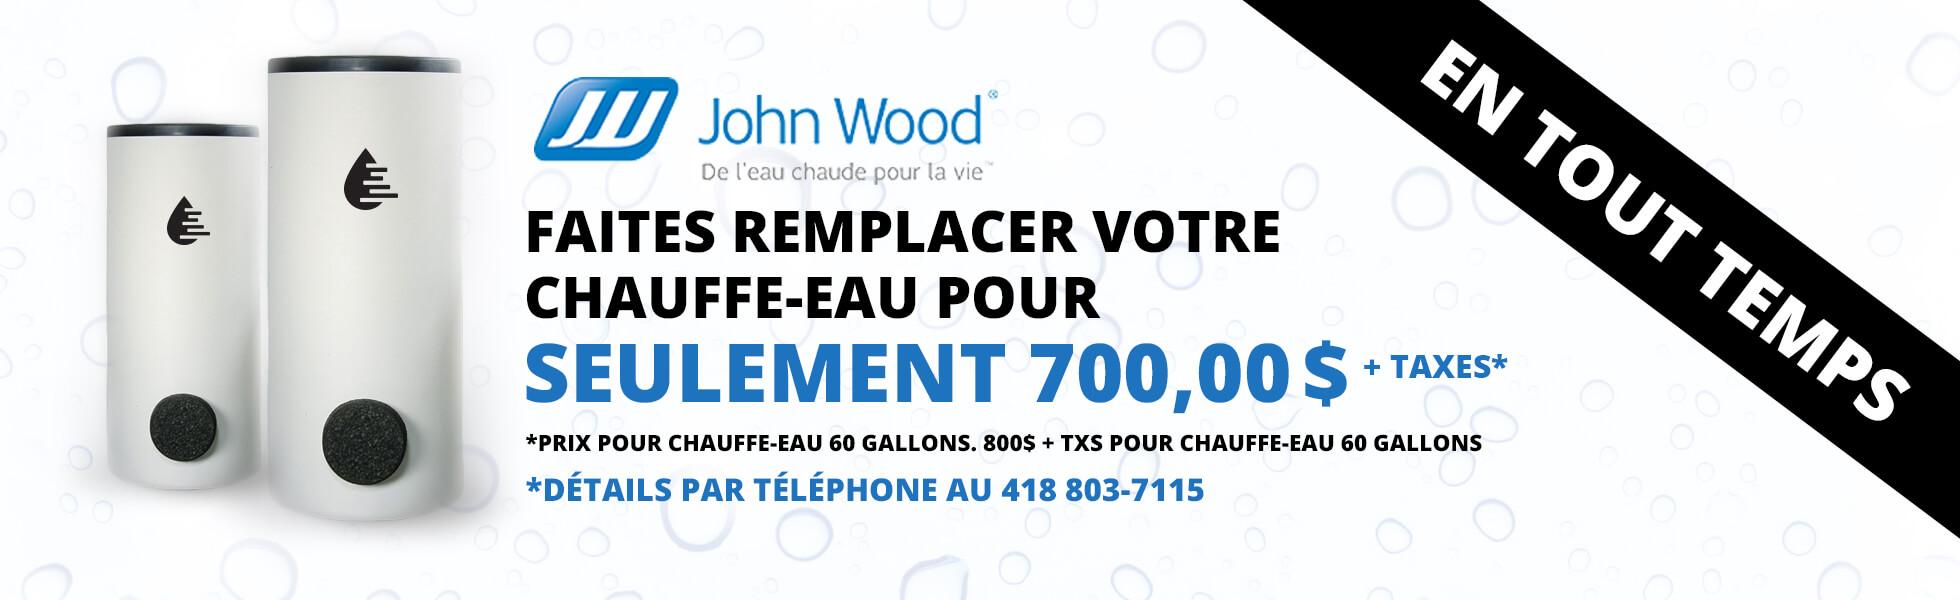 Chauffe-eau-permanent-plomberie-quessy-25-sept-2018